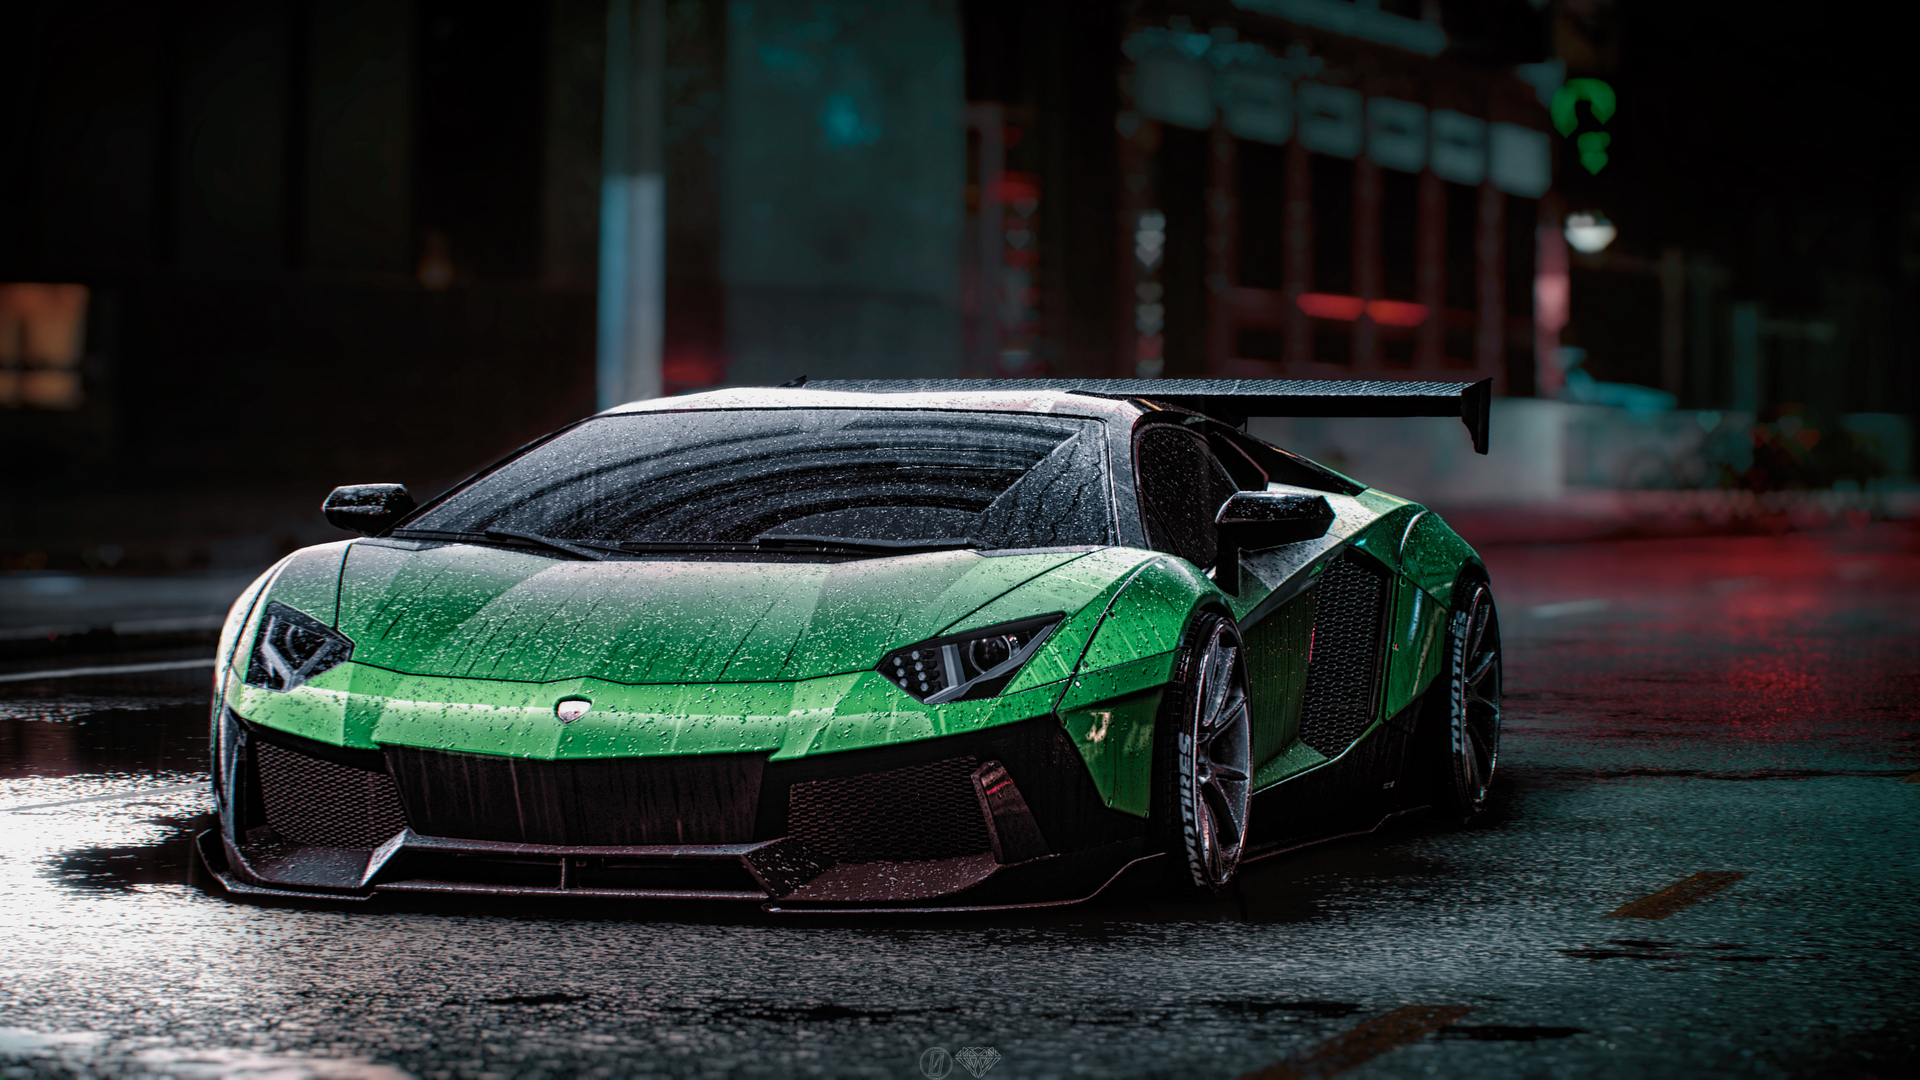 Lamborghini Aventador: Lamborghini Aventador Wallpaper 1080p